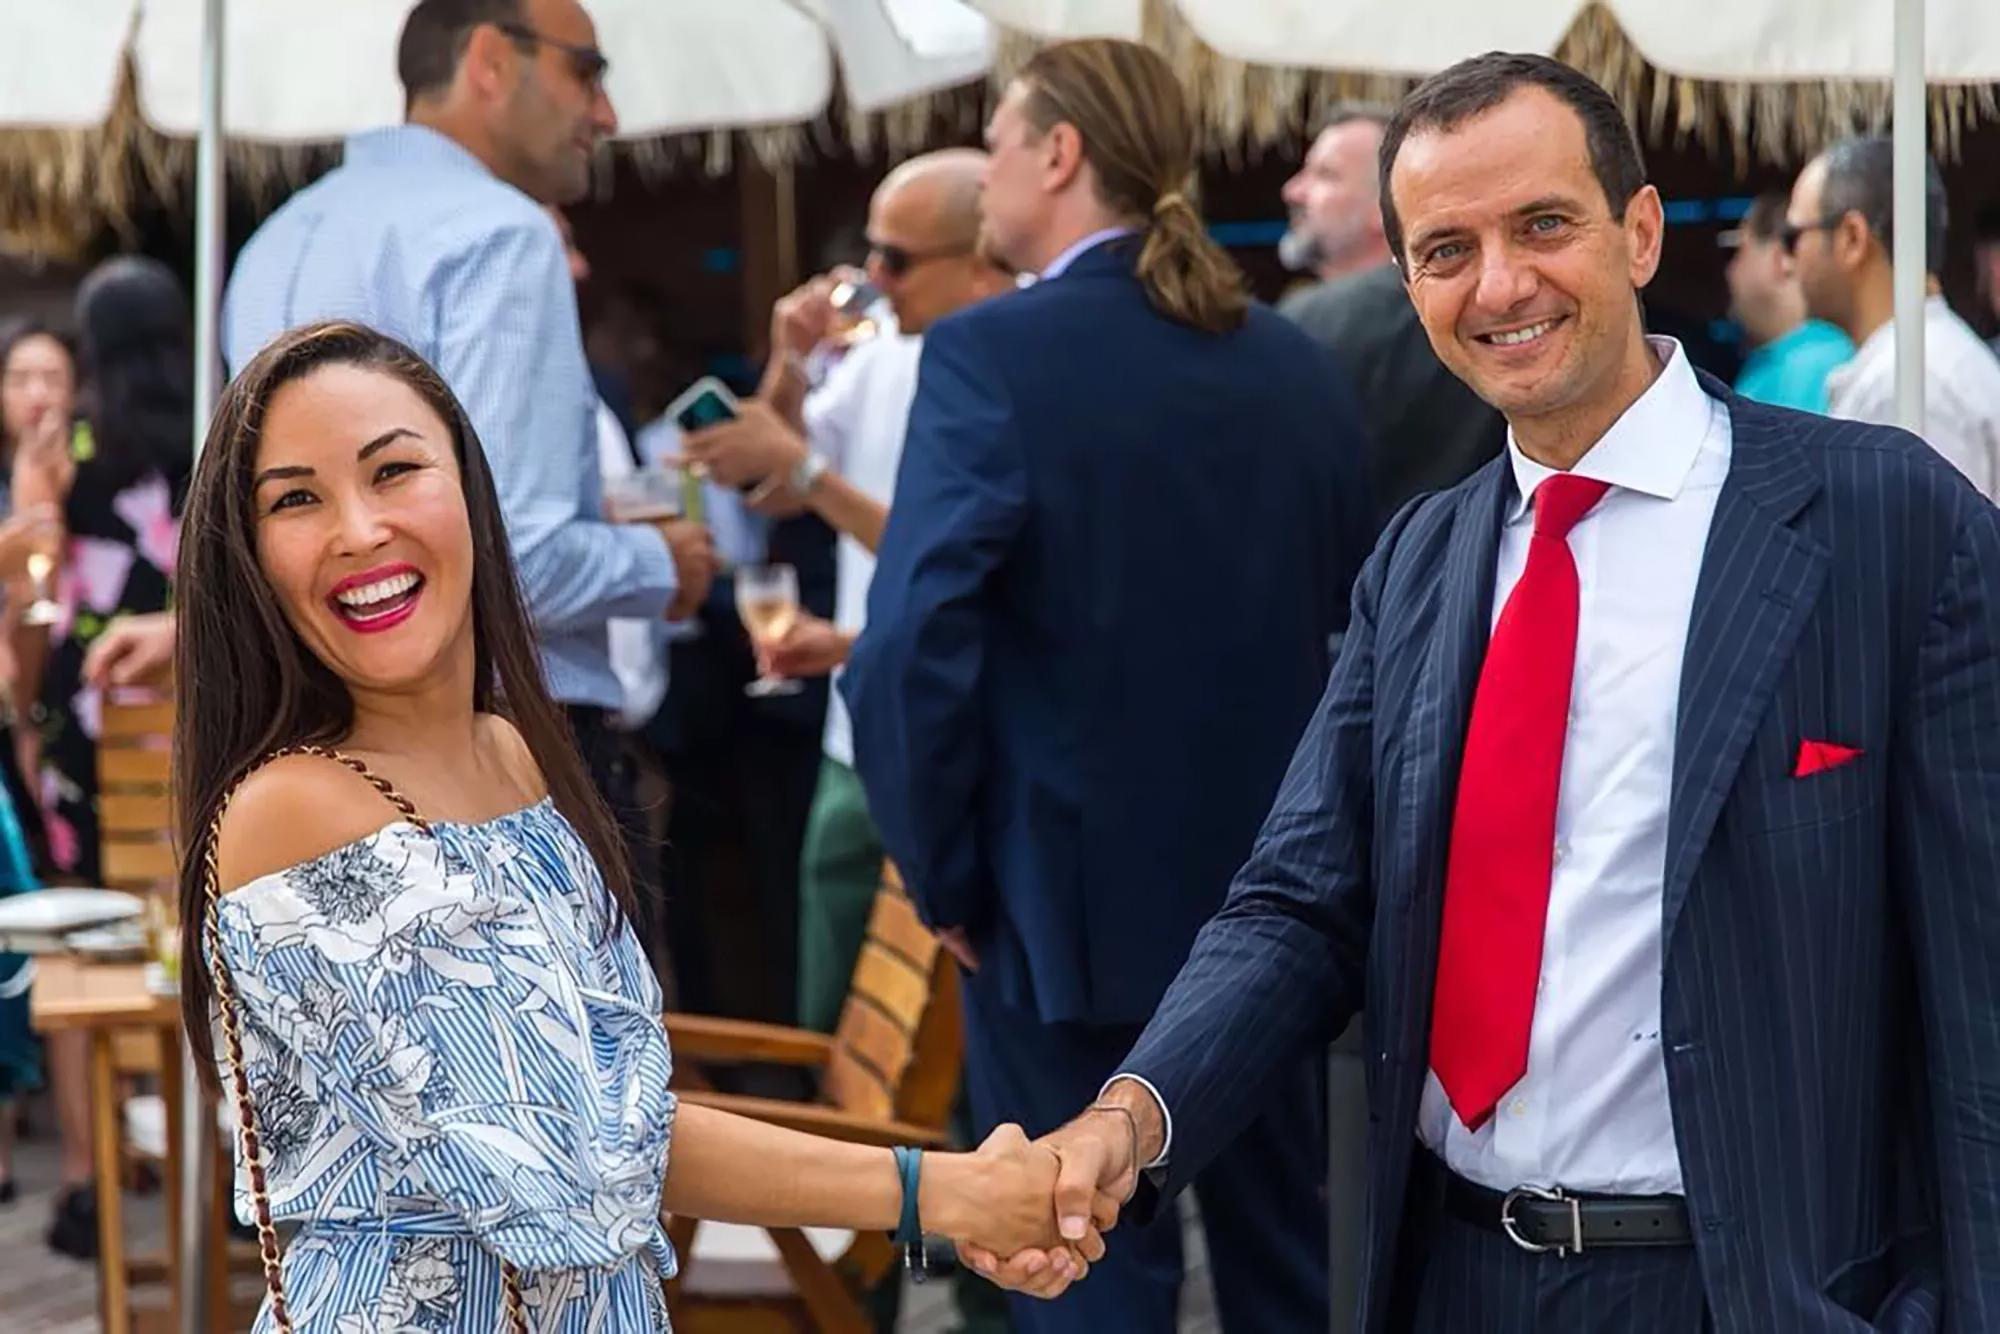 Gulshat Uzenbaeva, LUXPRO Founder, Giuseppe Ambrosio, President of the Monaco Single and Multi-Family office international association